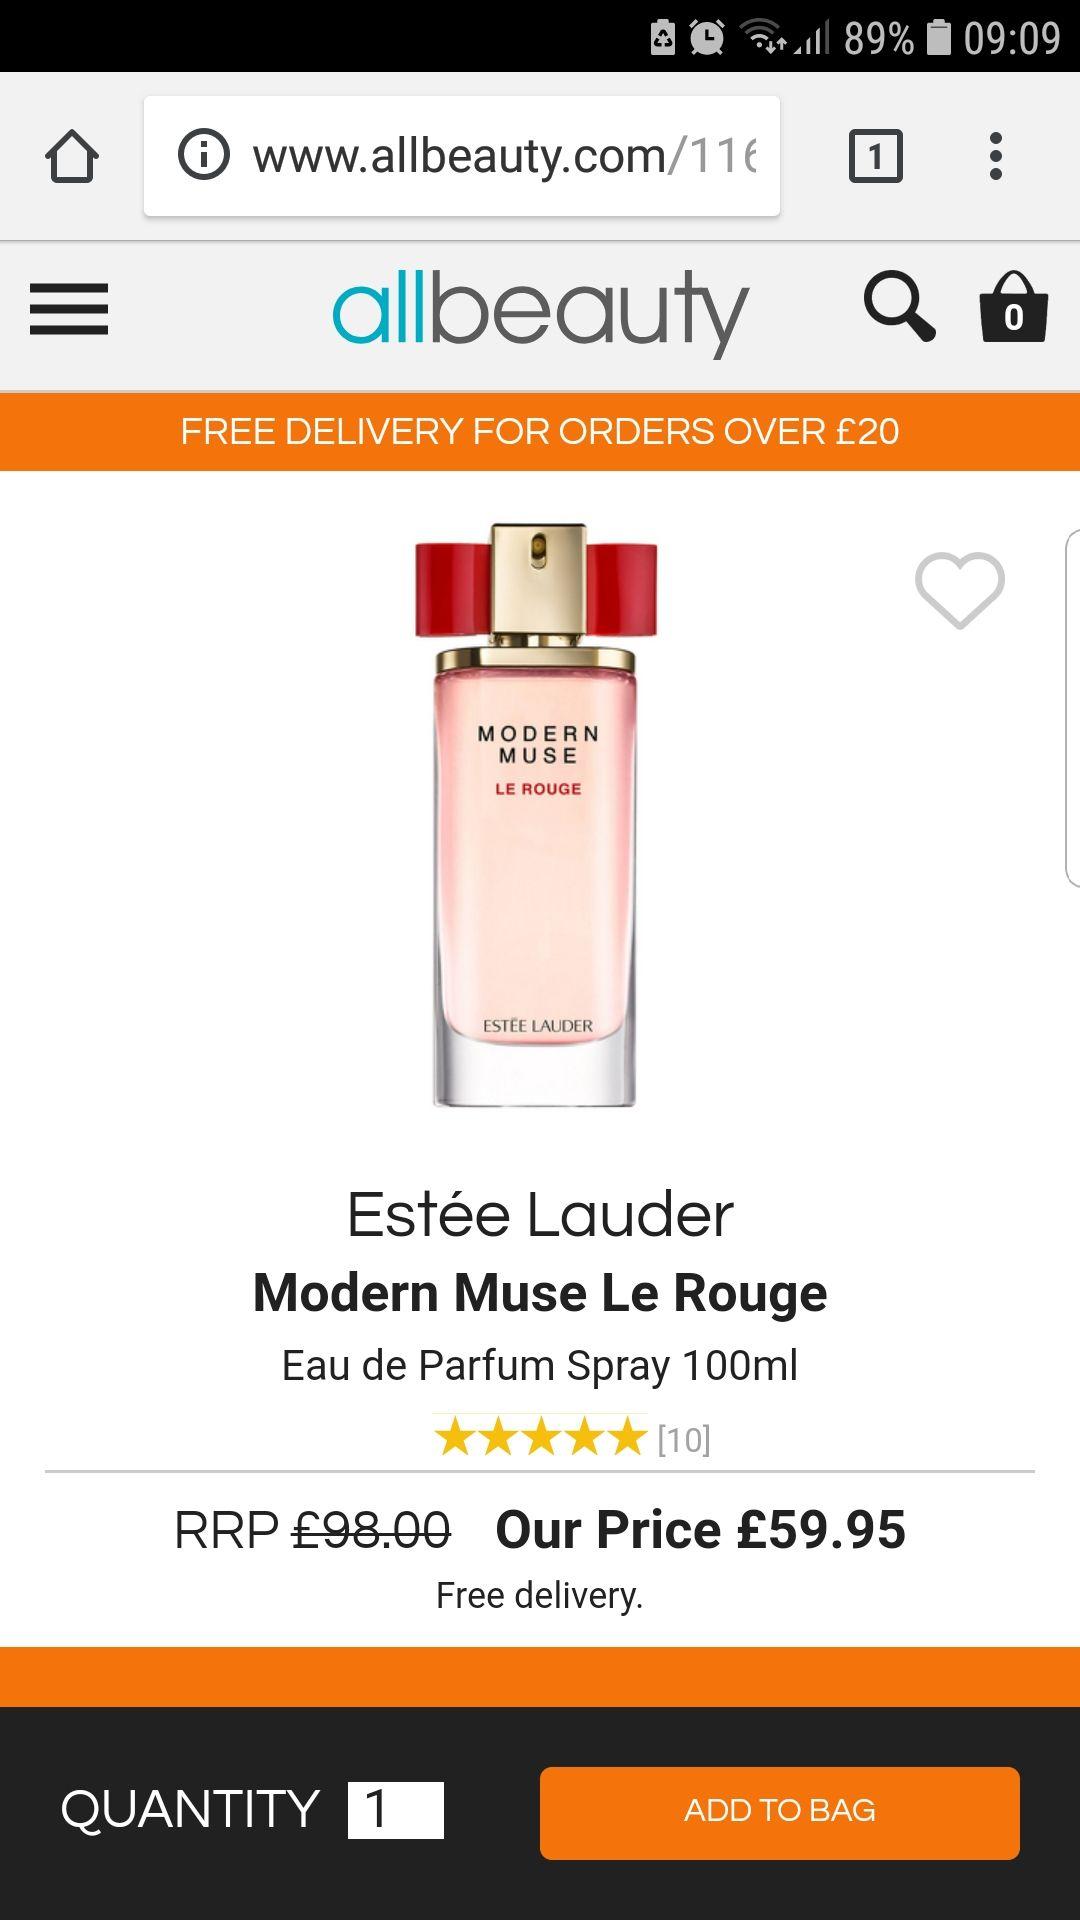 Estee Lauder Modern Muse Le  Rouge £100 ML £59.95 @ All beauty